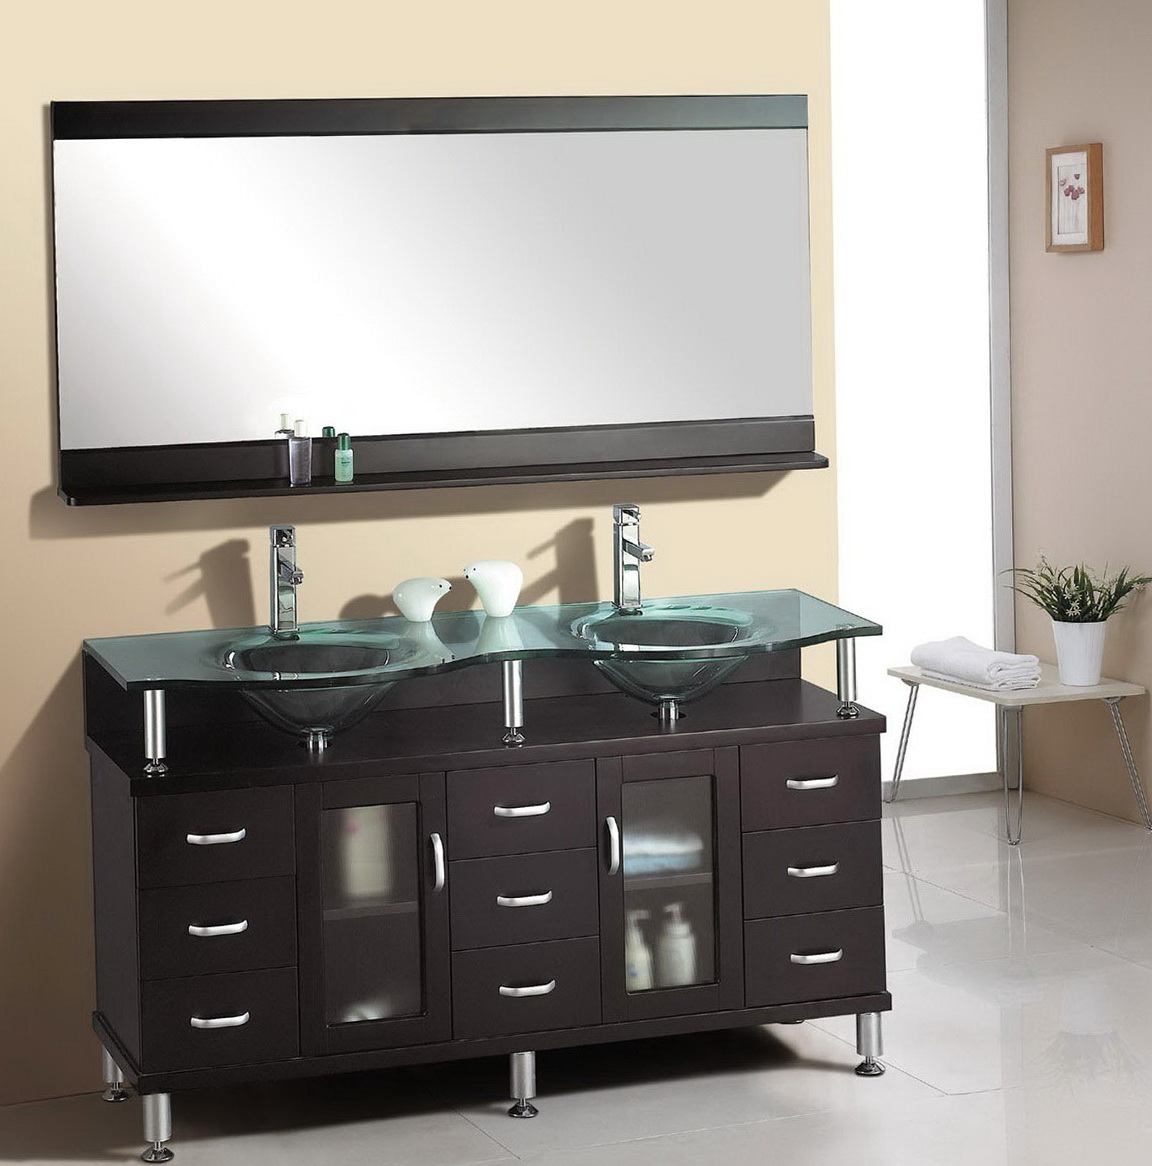 Standard Bathroom Vanity Height Nz